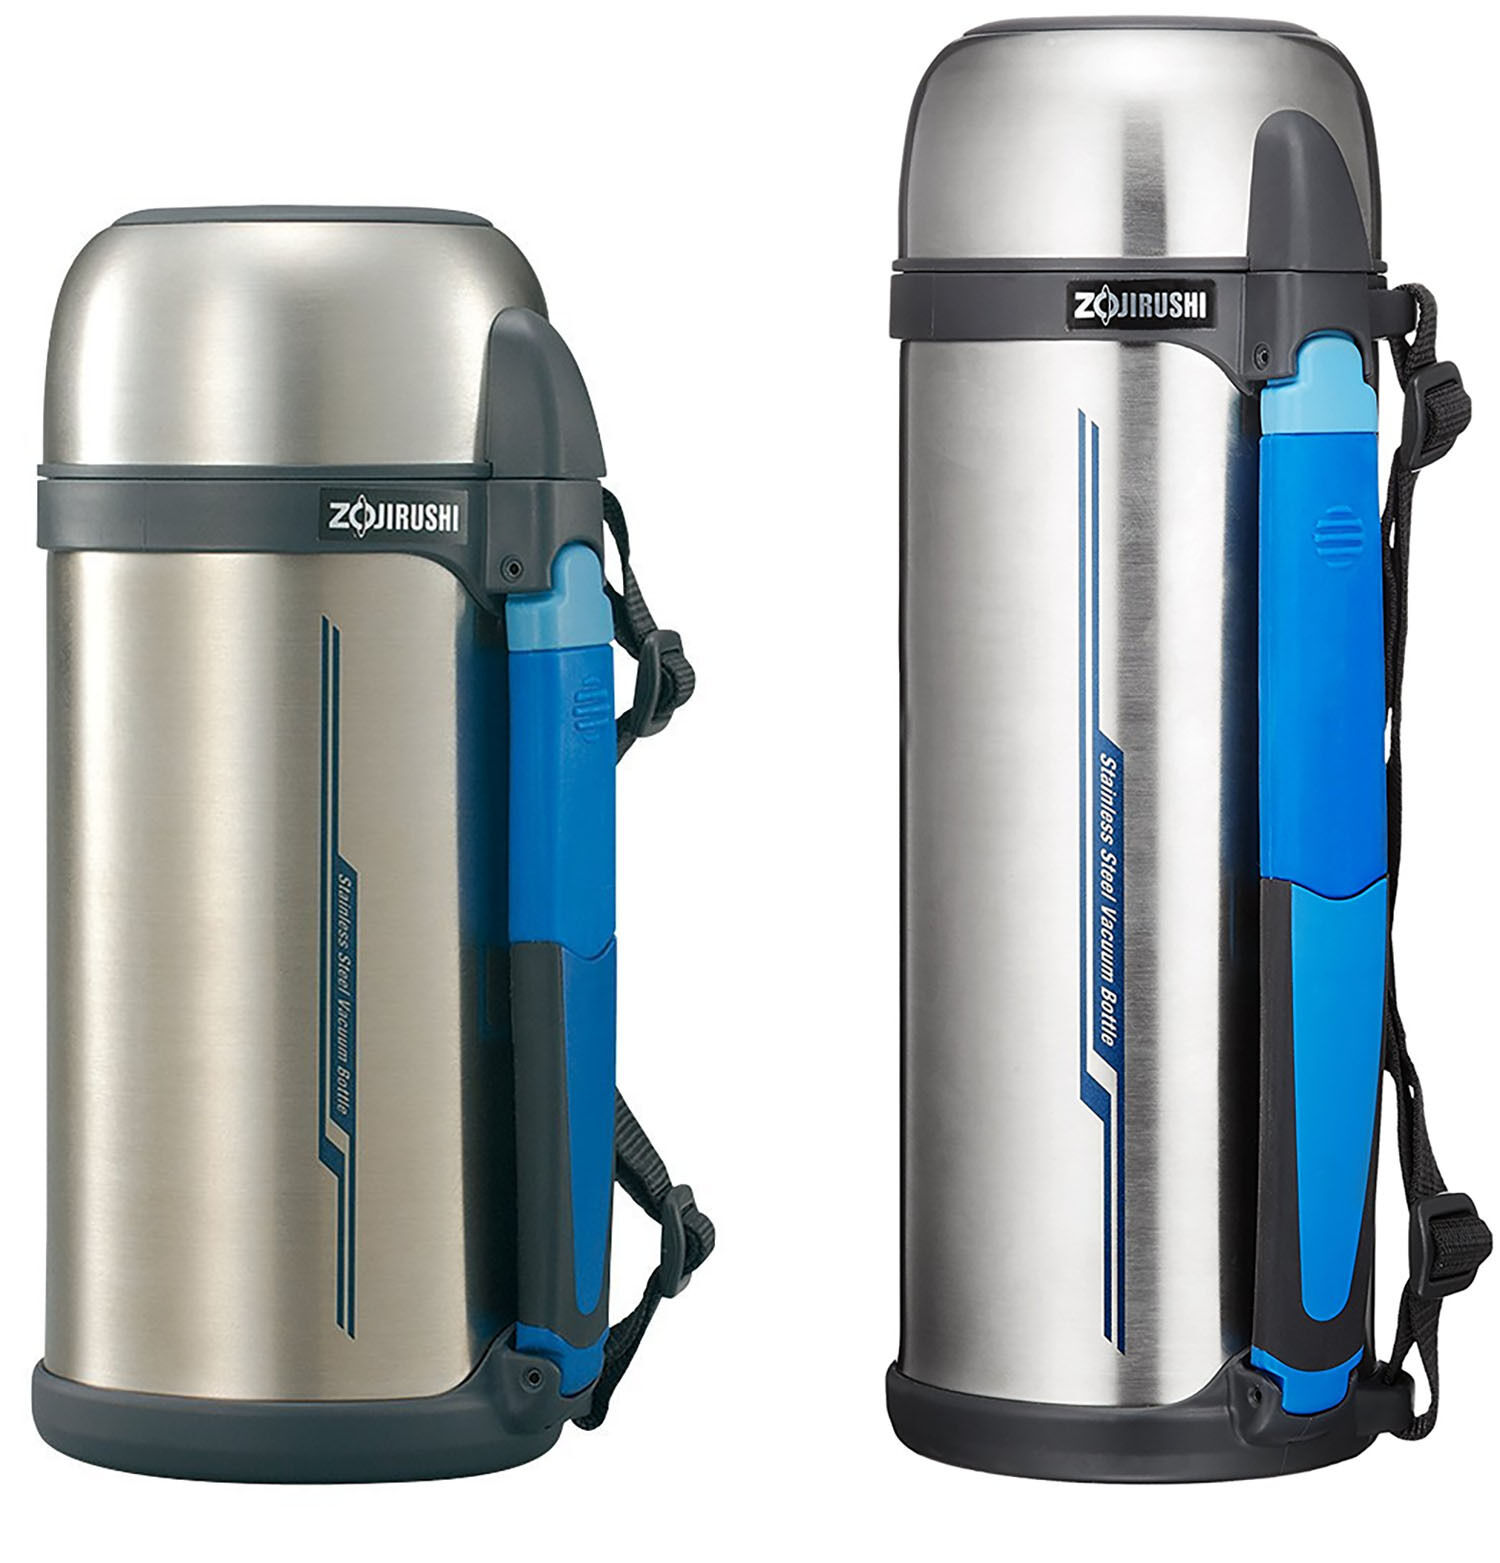 Zojirushi Sports Bottle: Zojirushi SF-CC Tuff Sports Thermos Container, 2 Sizes